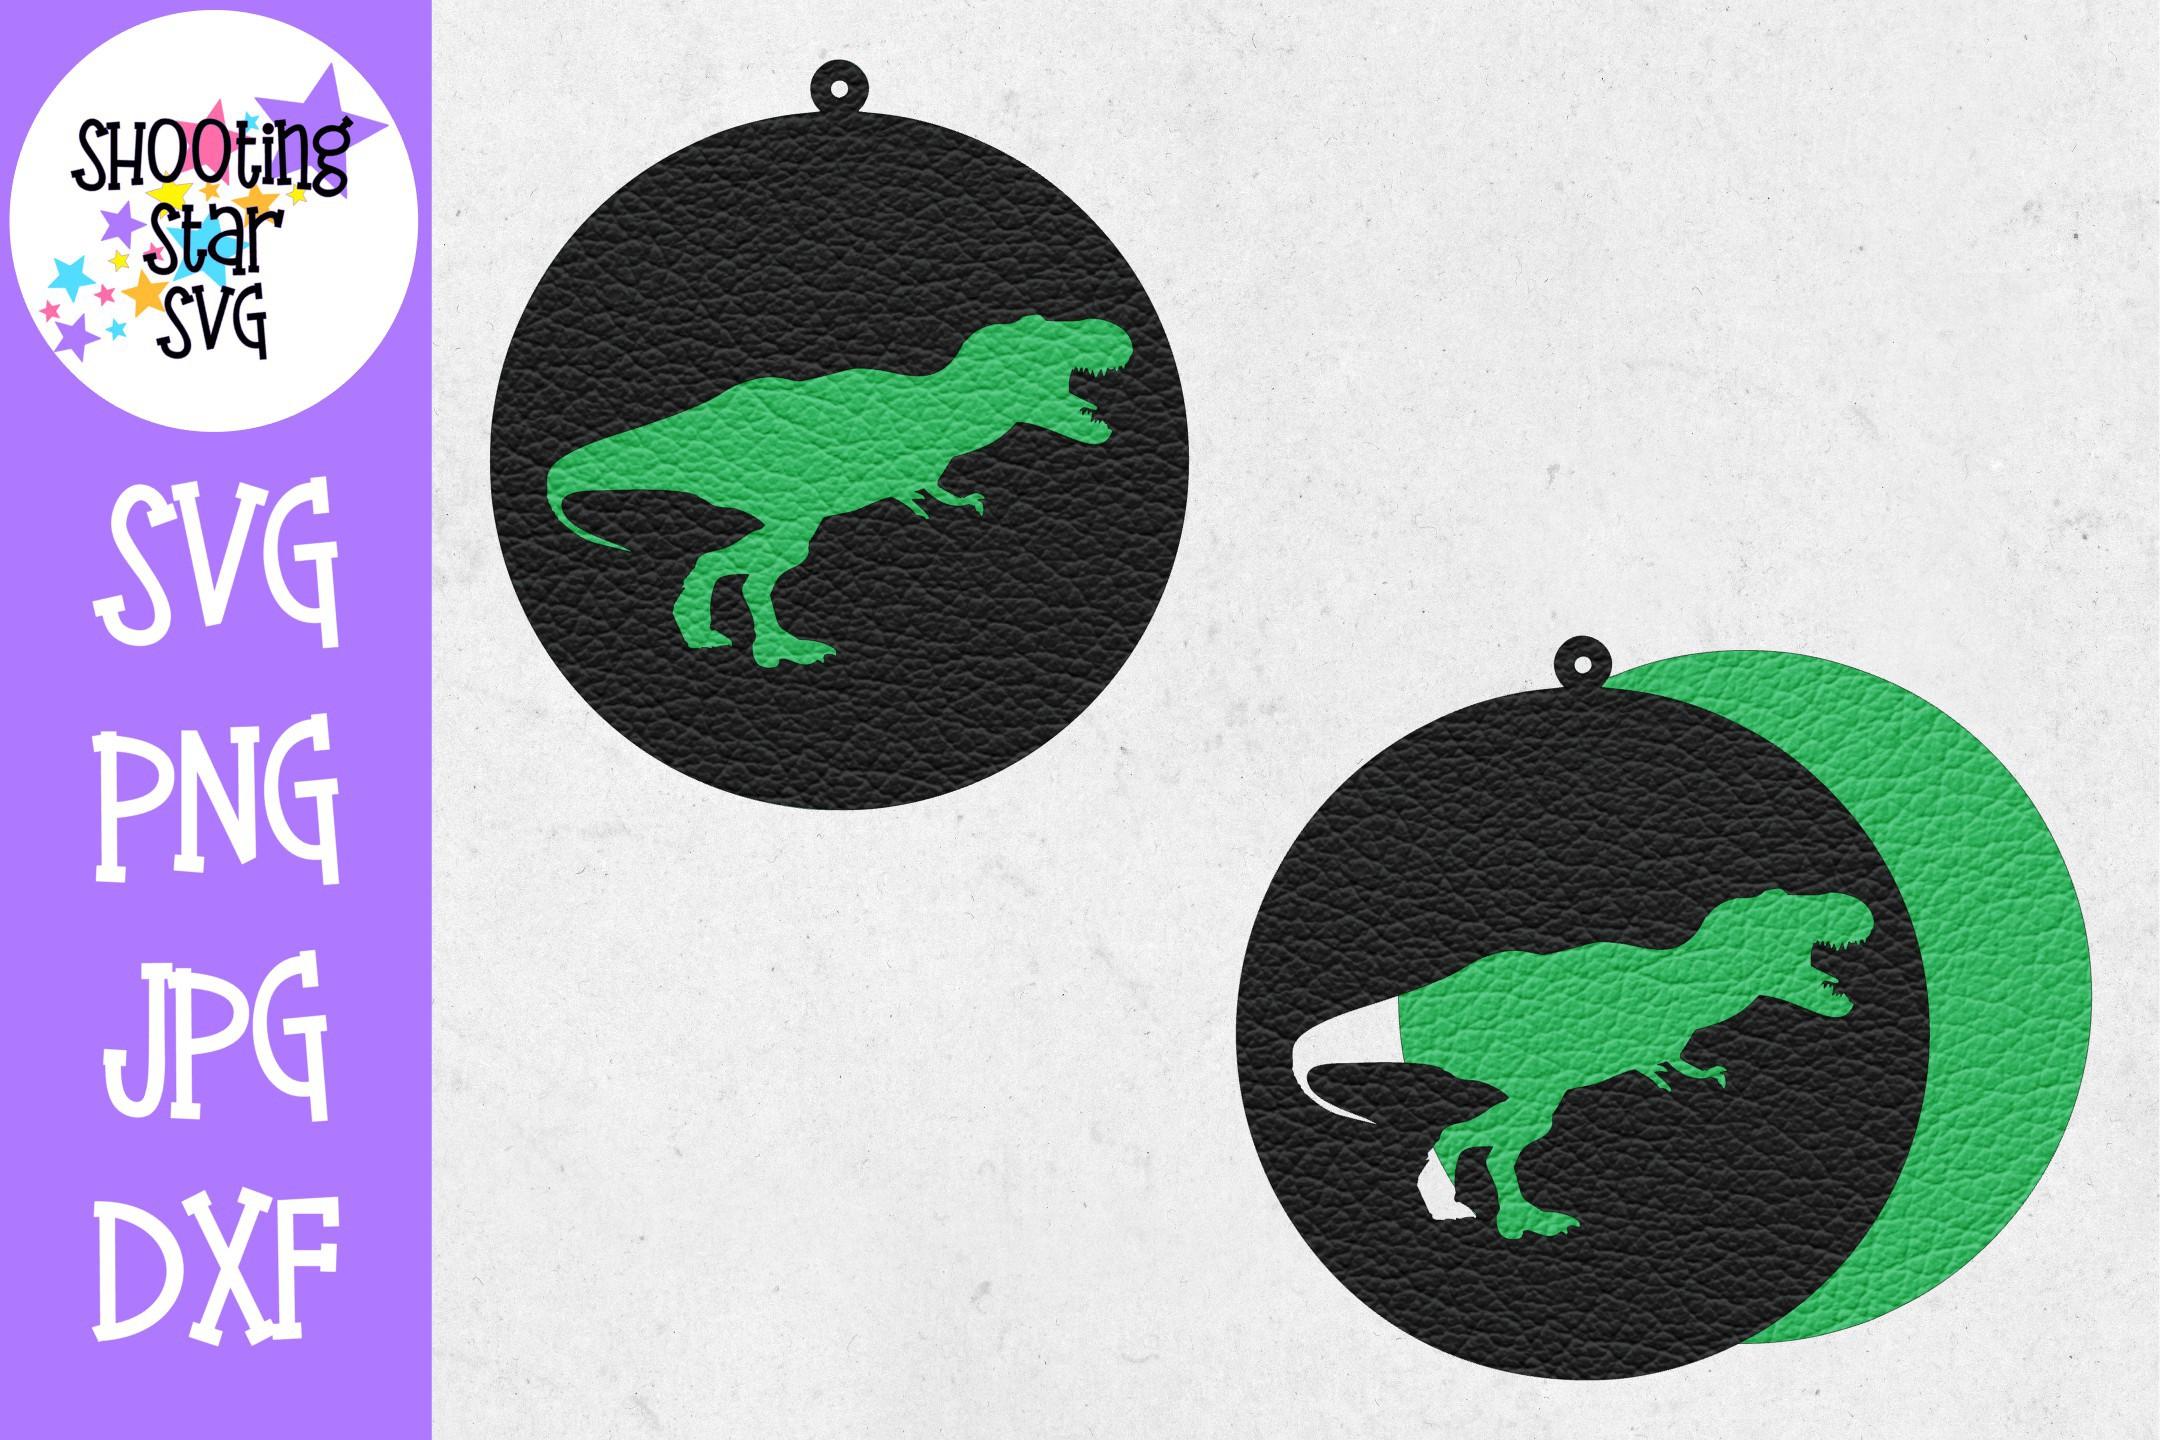 Dinosaur Earring SVG Template - Earring SVG - Dinosaur SVG example image 2